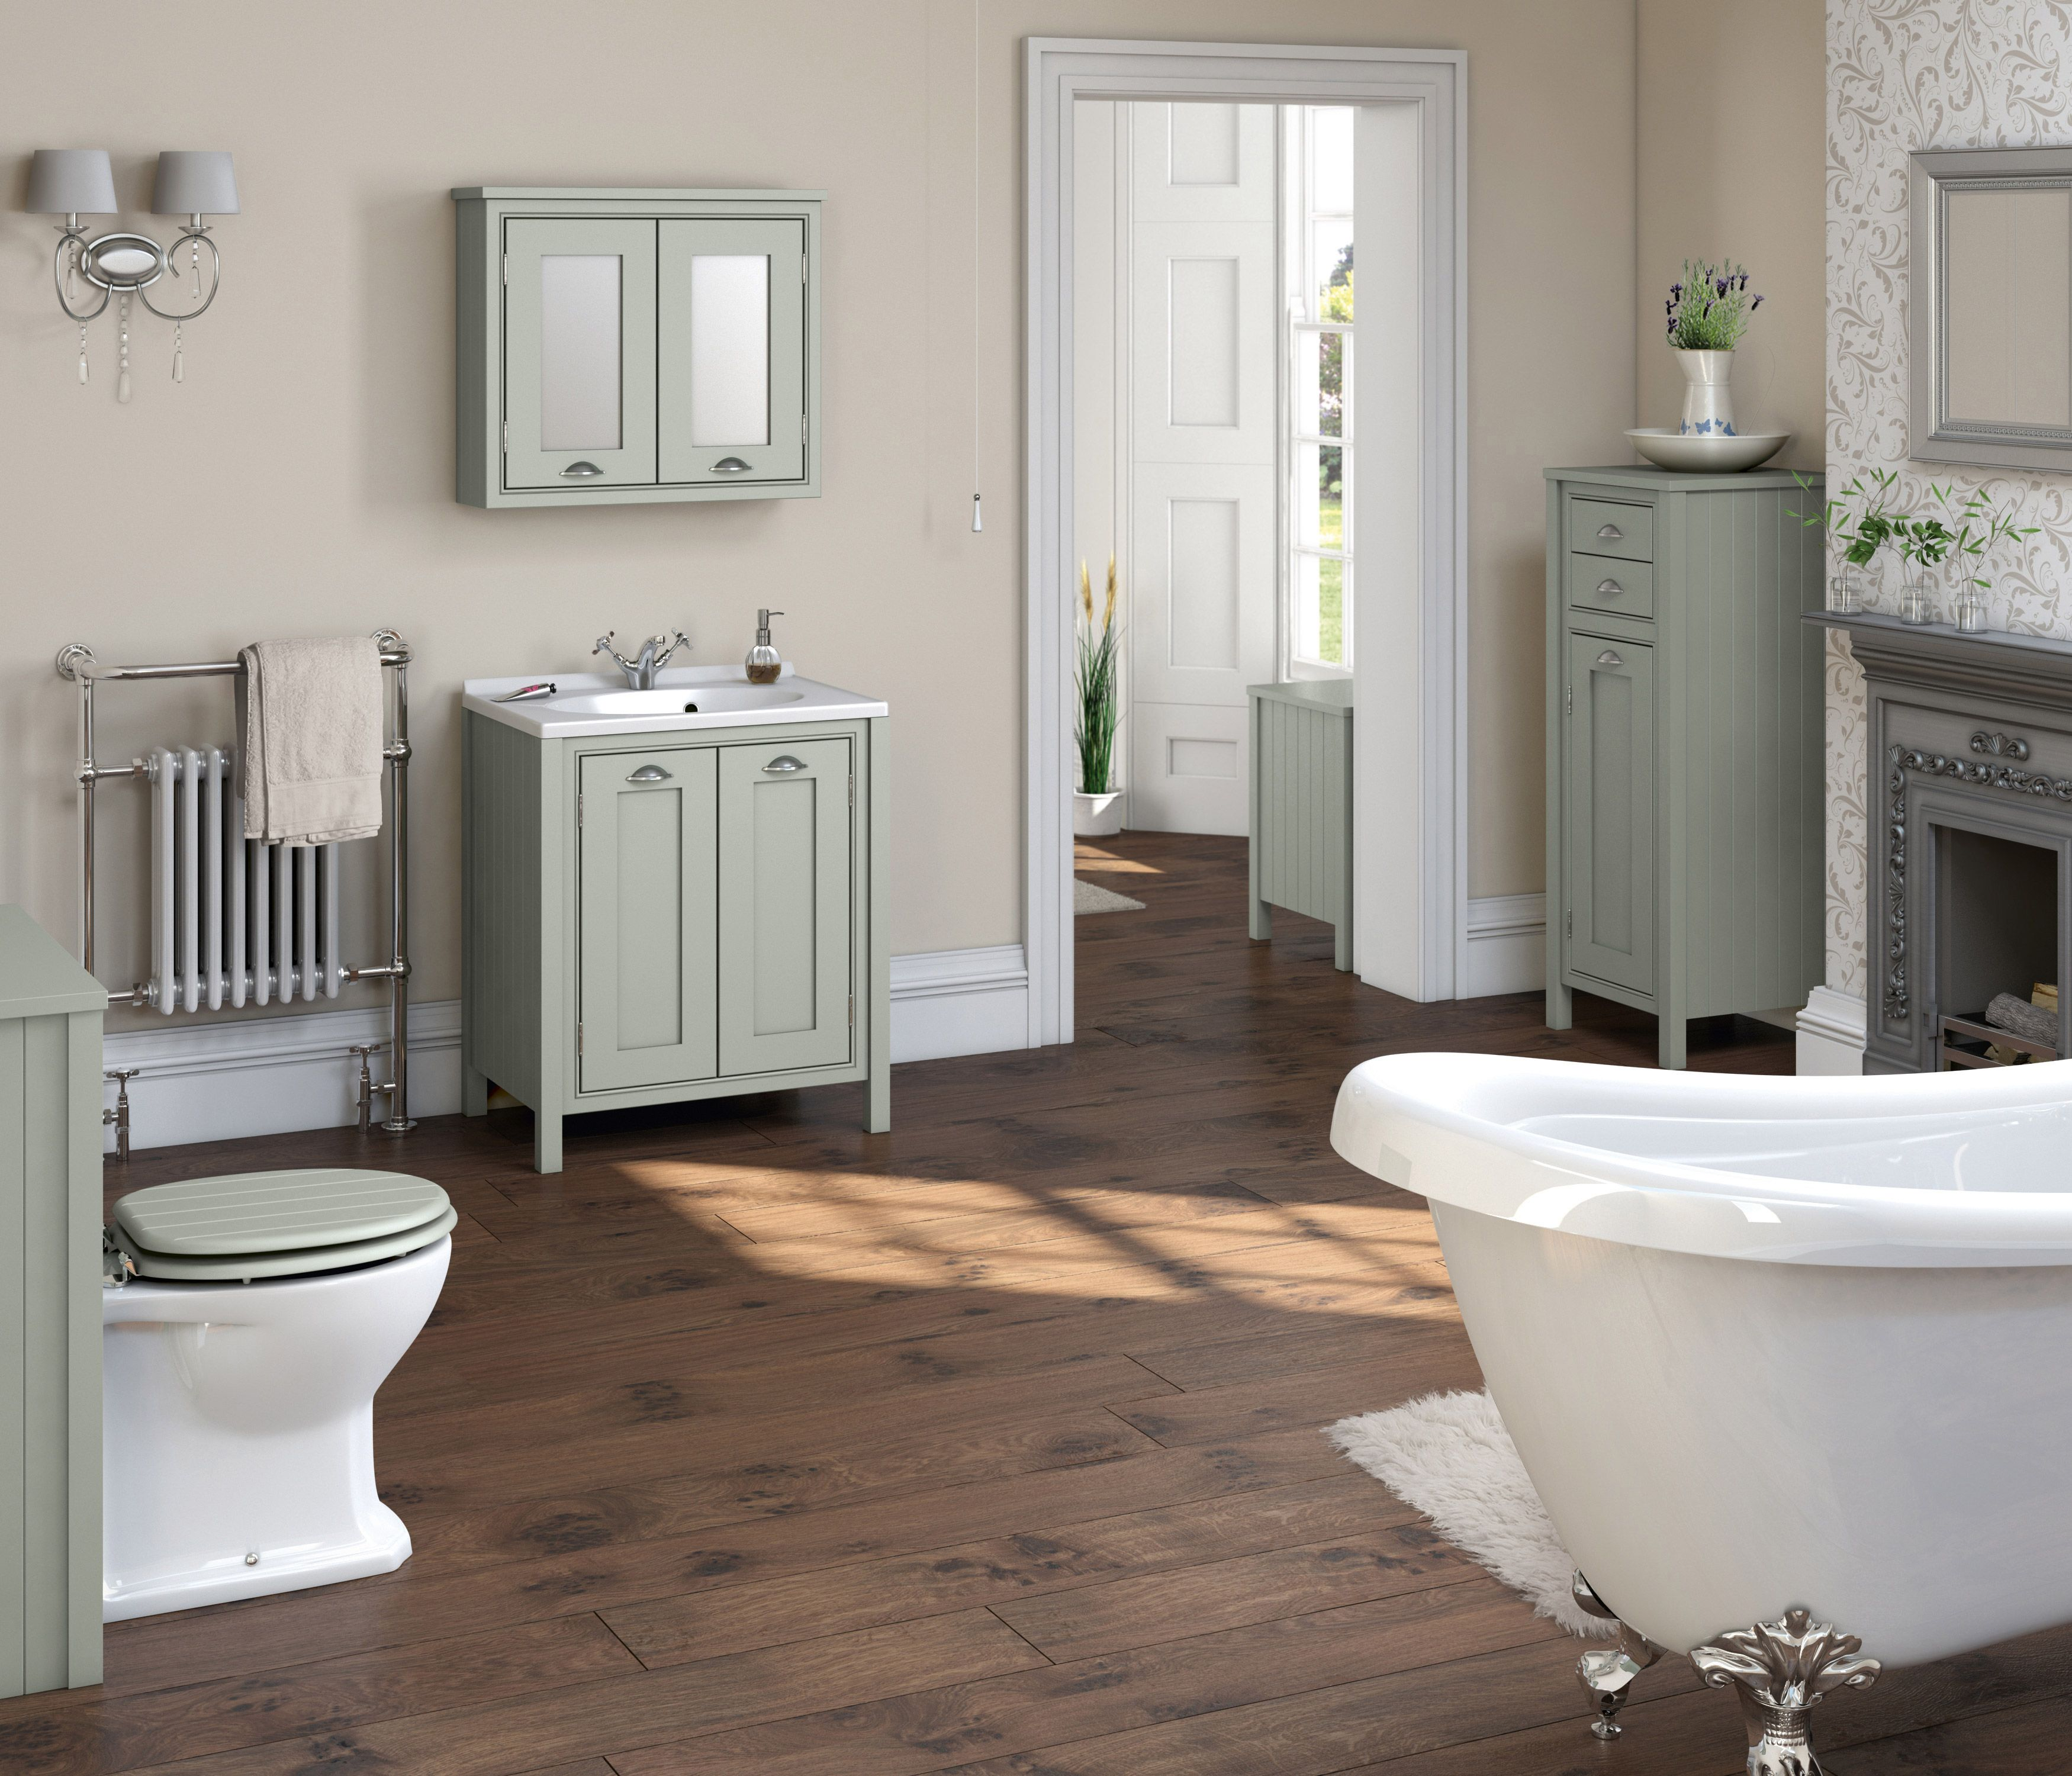 Traditional Bathroom Designs 31 Beautiful Traditional Bathroom Design  Traditional Bathroom